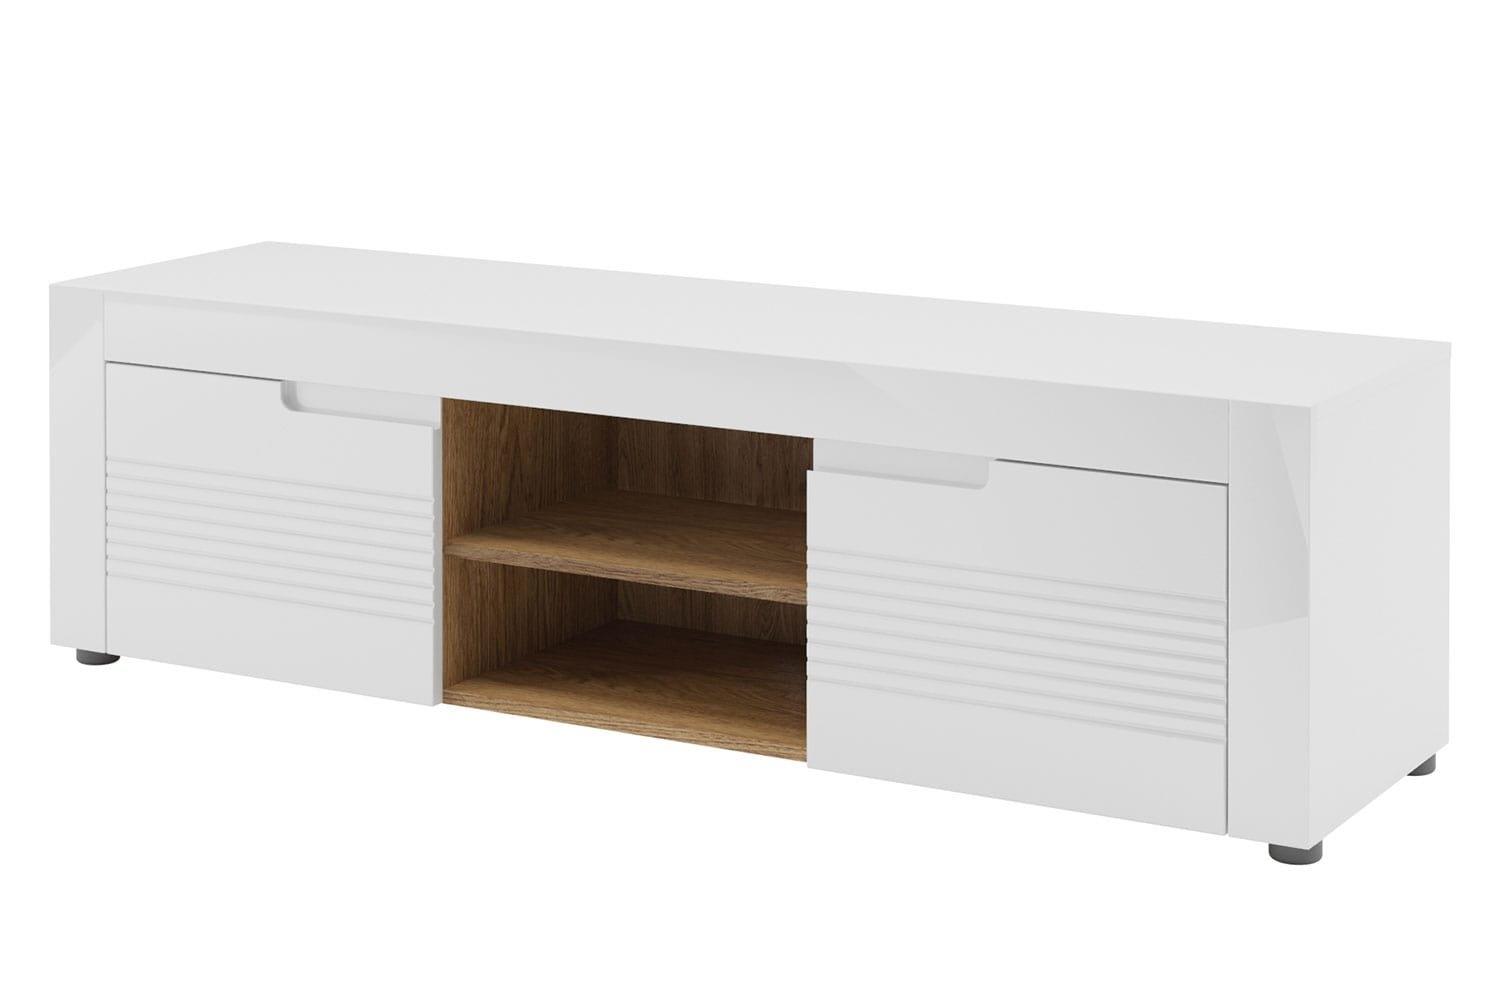 Comoda TV din pal si MDF, cu 2 usi Belfort 25 Alb, l150xA41xH44 cm imagine